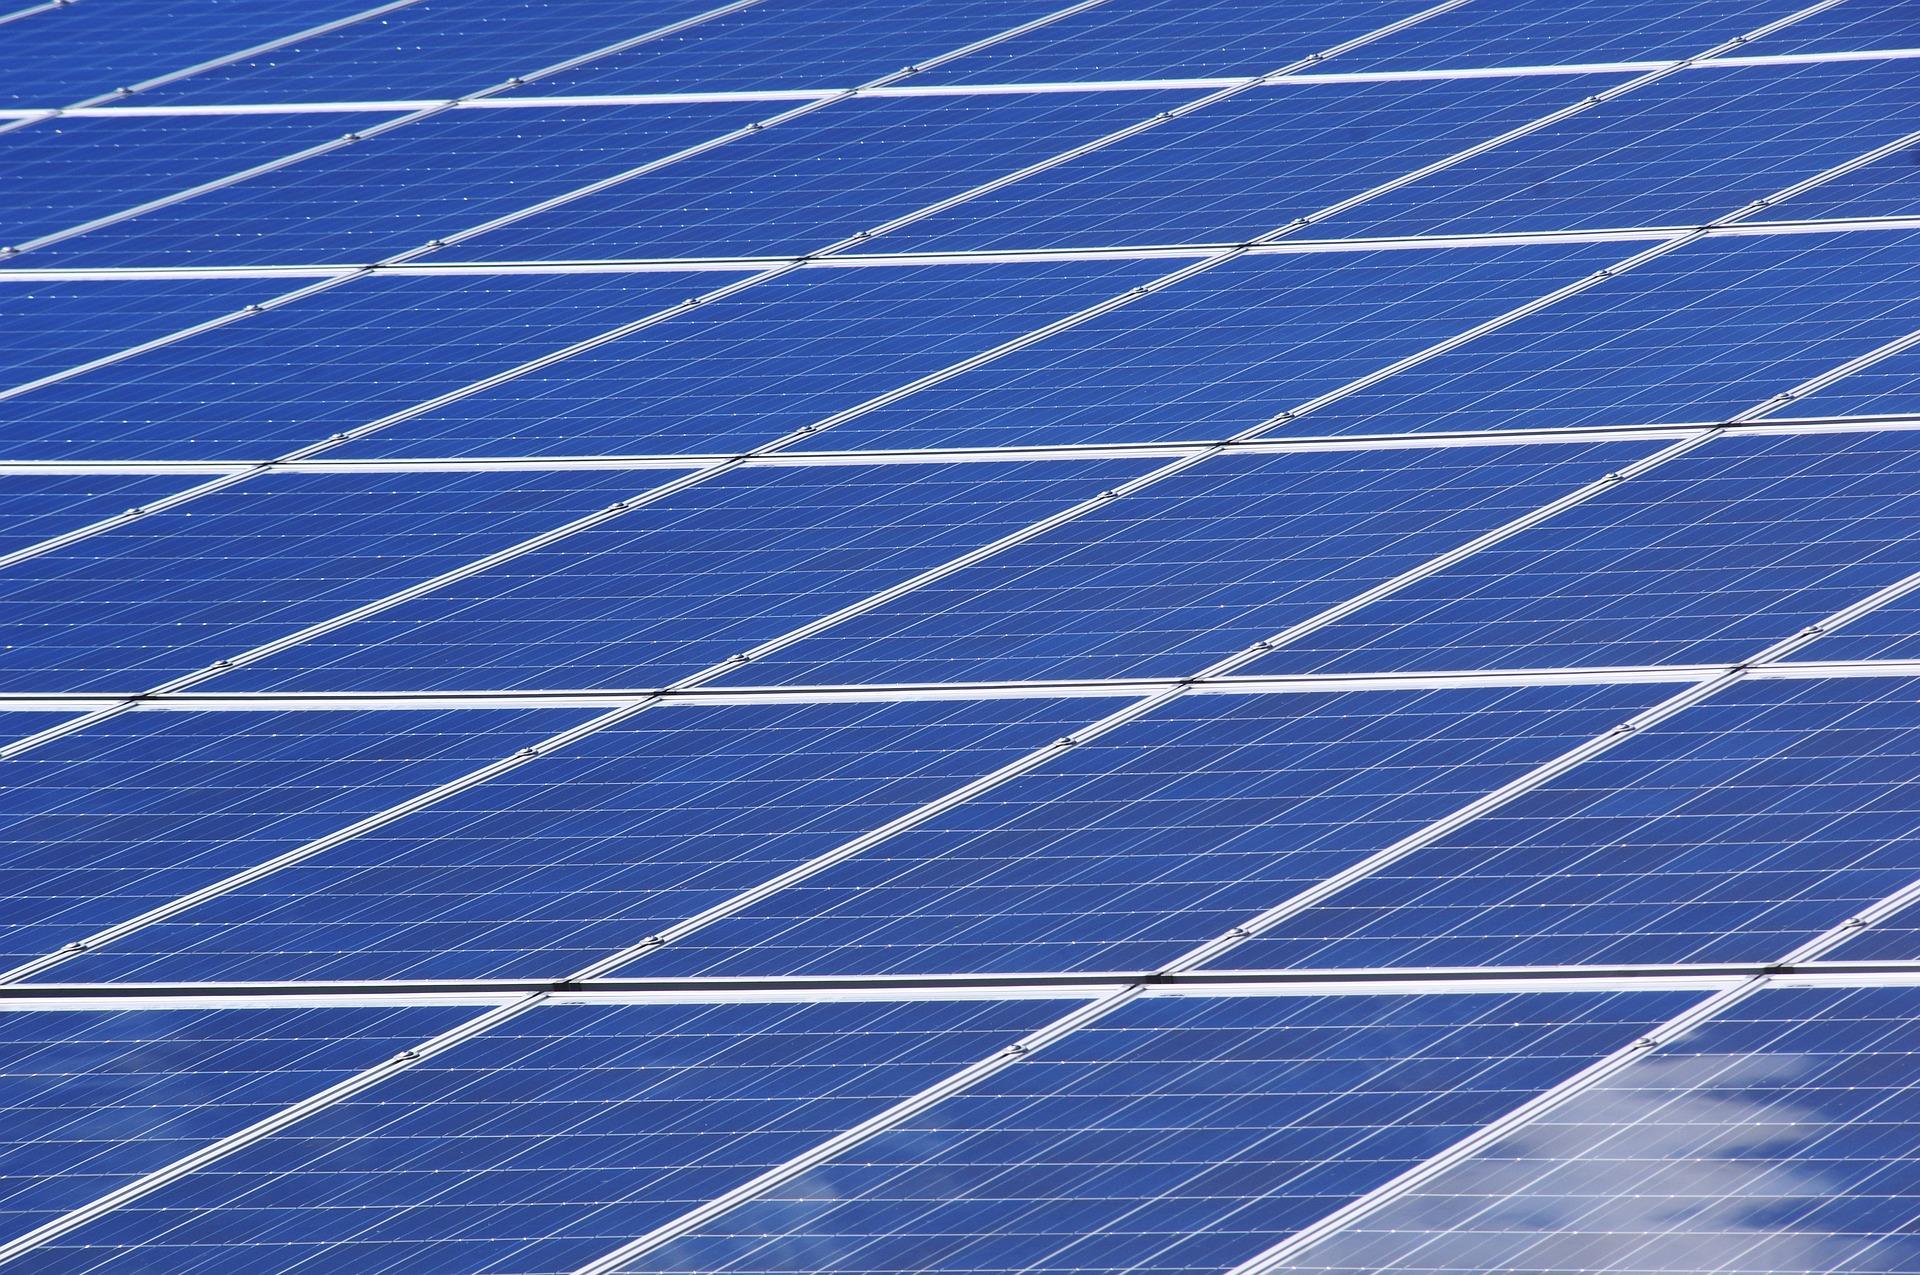 Indian Solar Developers Have Had A Bumpy Ride Greenbarrel